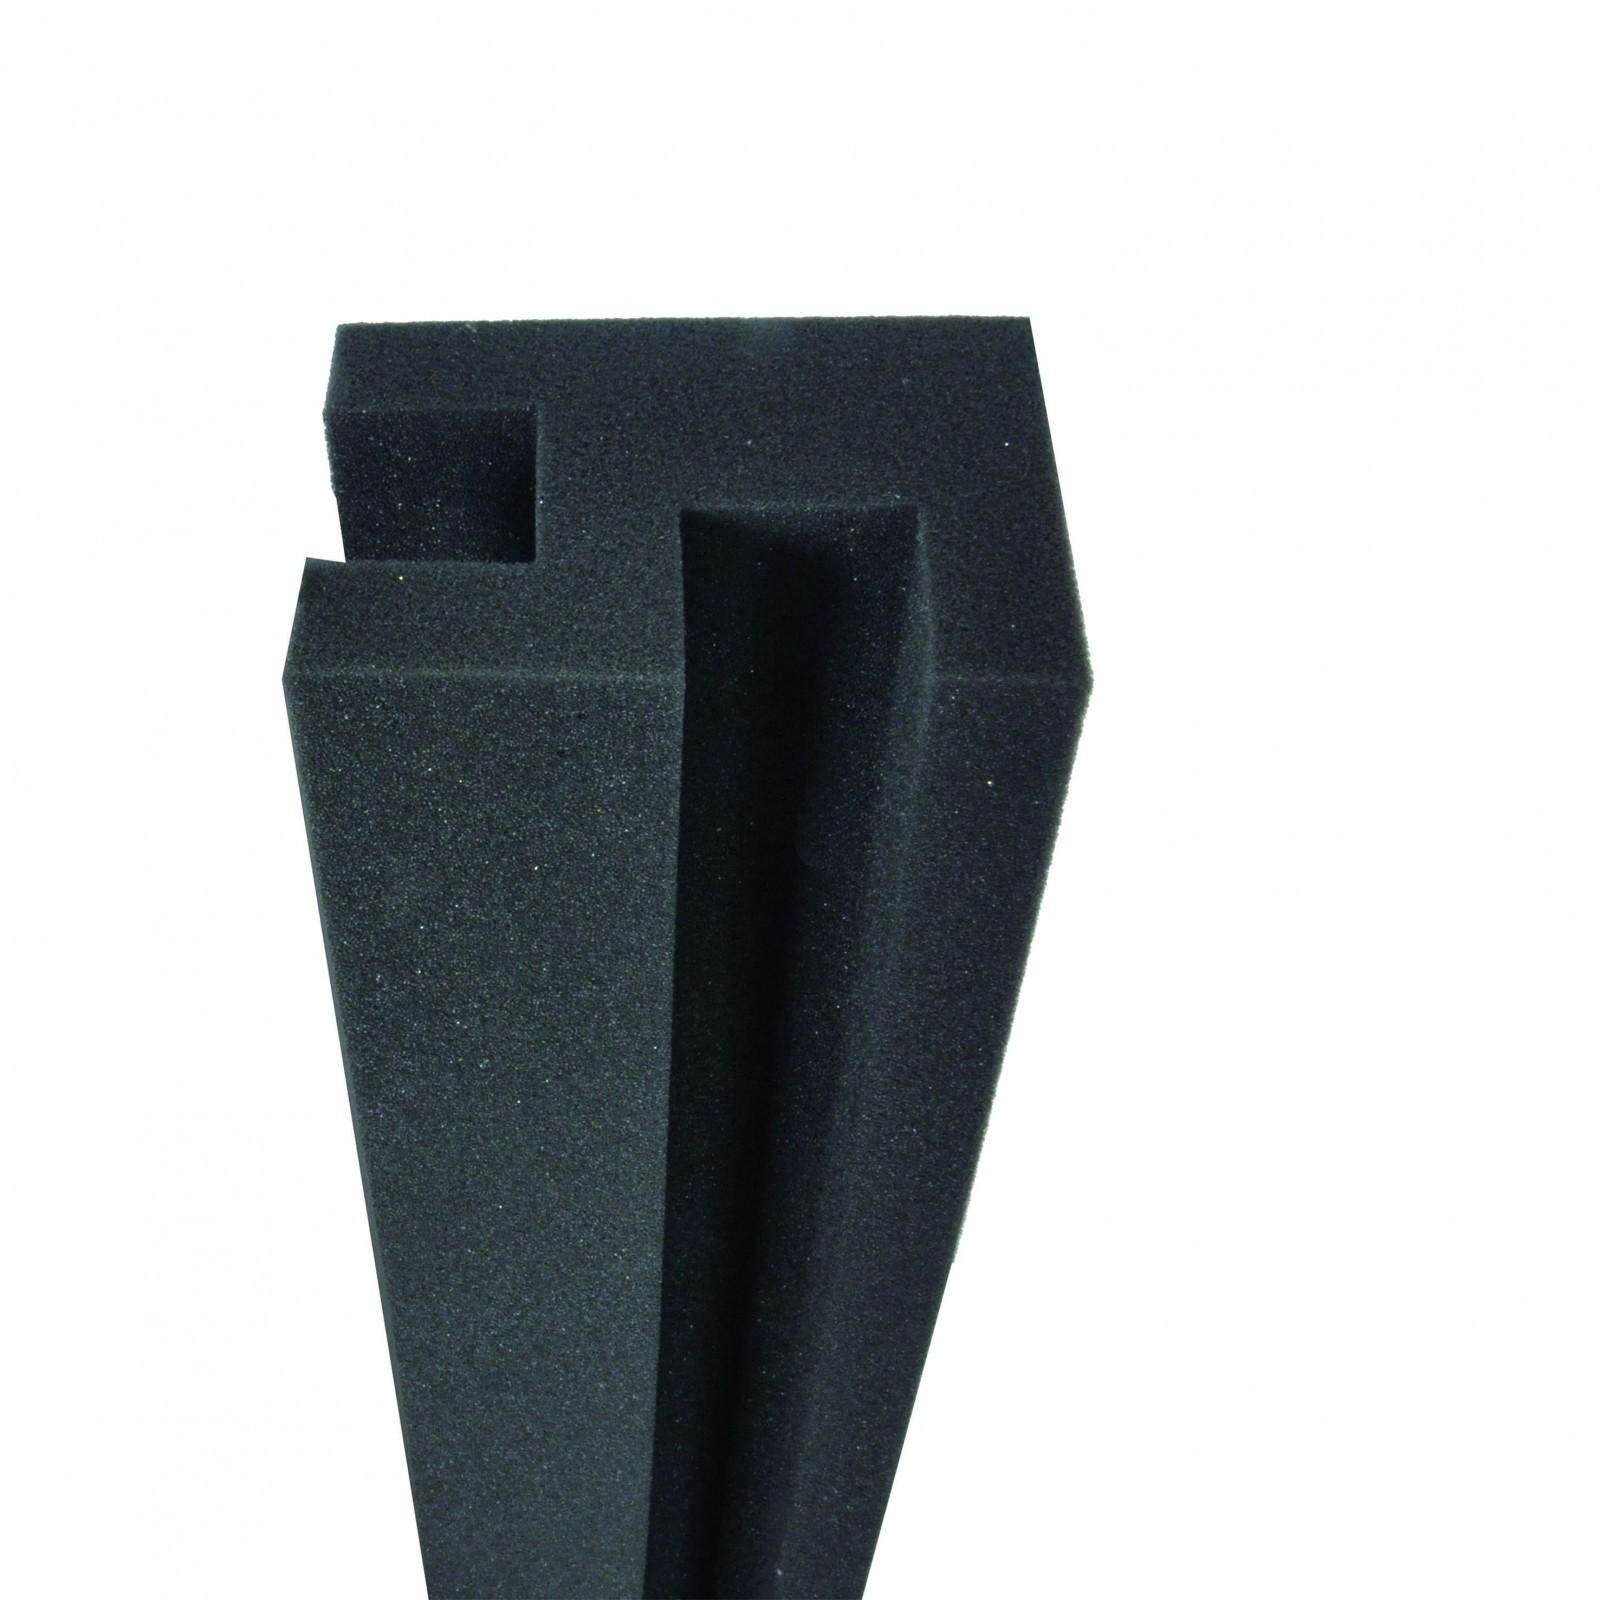 power studio foam 400 angle angle foam 400 panel. Black Bedroom Furniture Sets. Home Design Ideas